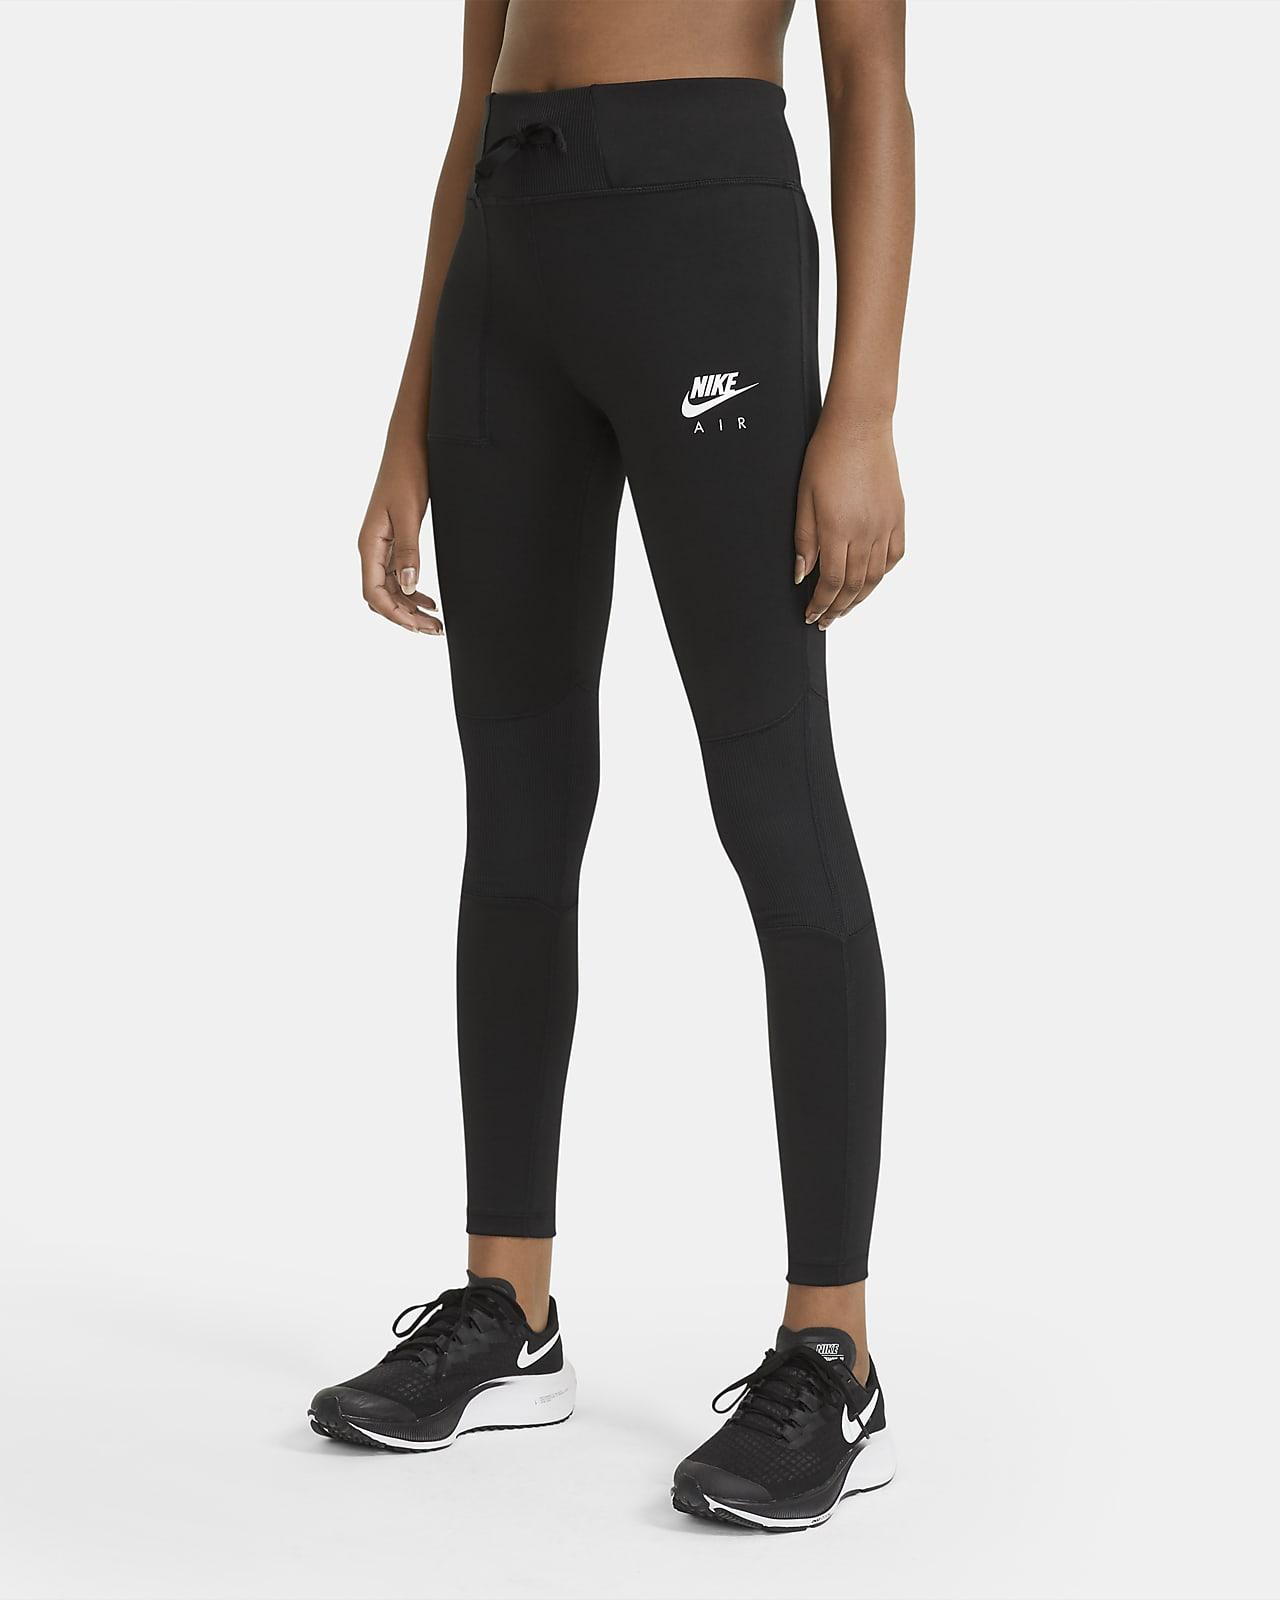 Nike Air Older Kids' (Girls') Training Leggings